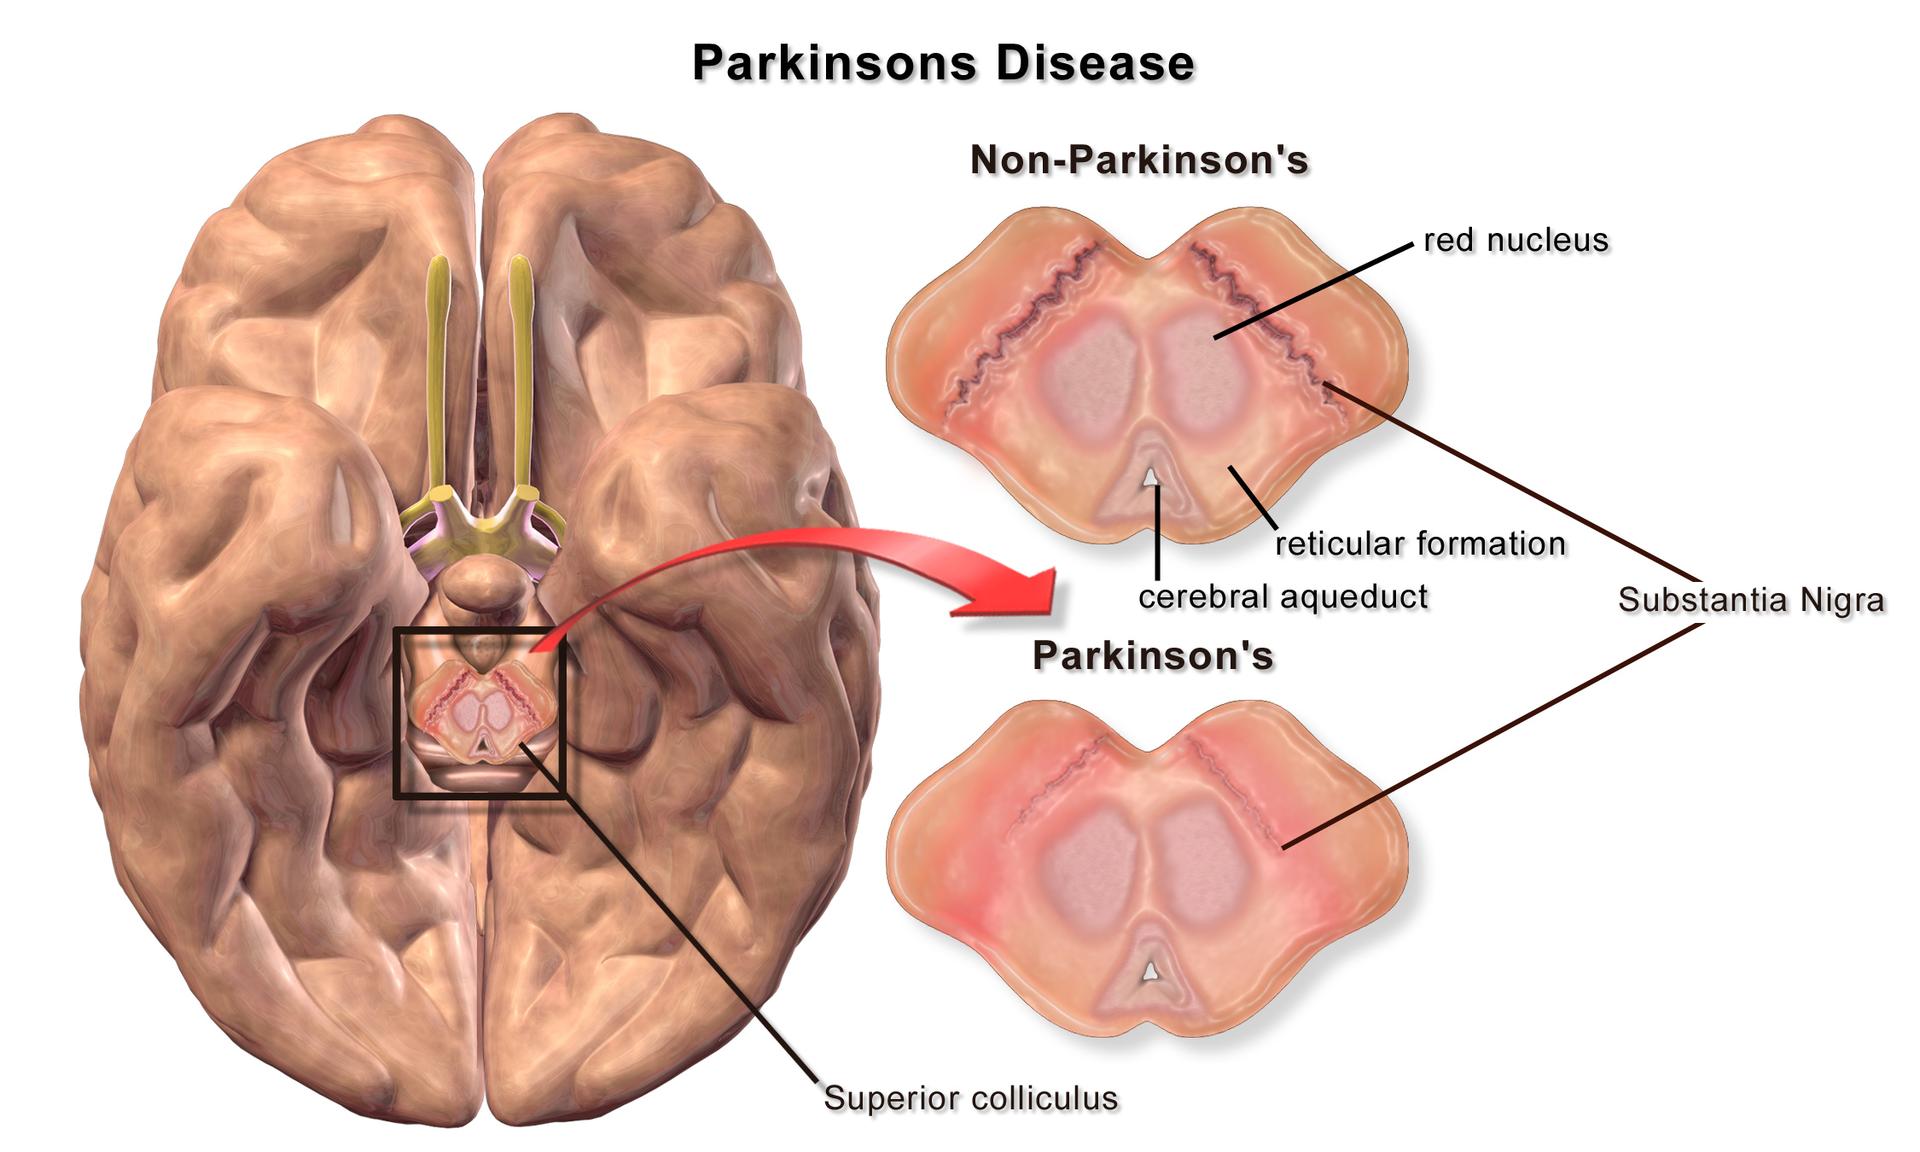 141222 Blausen_0704_ParkinsonsDisease[1]